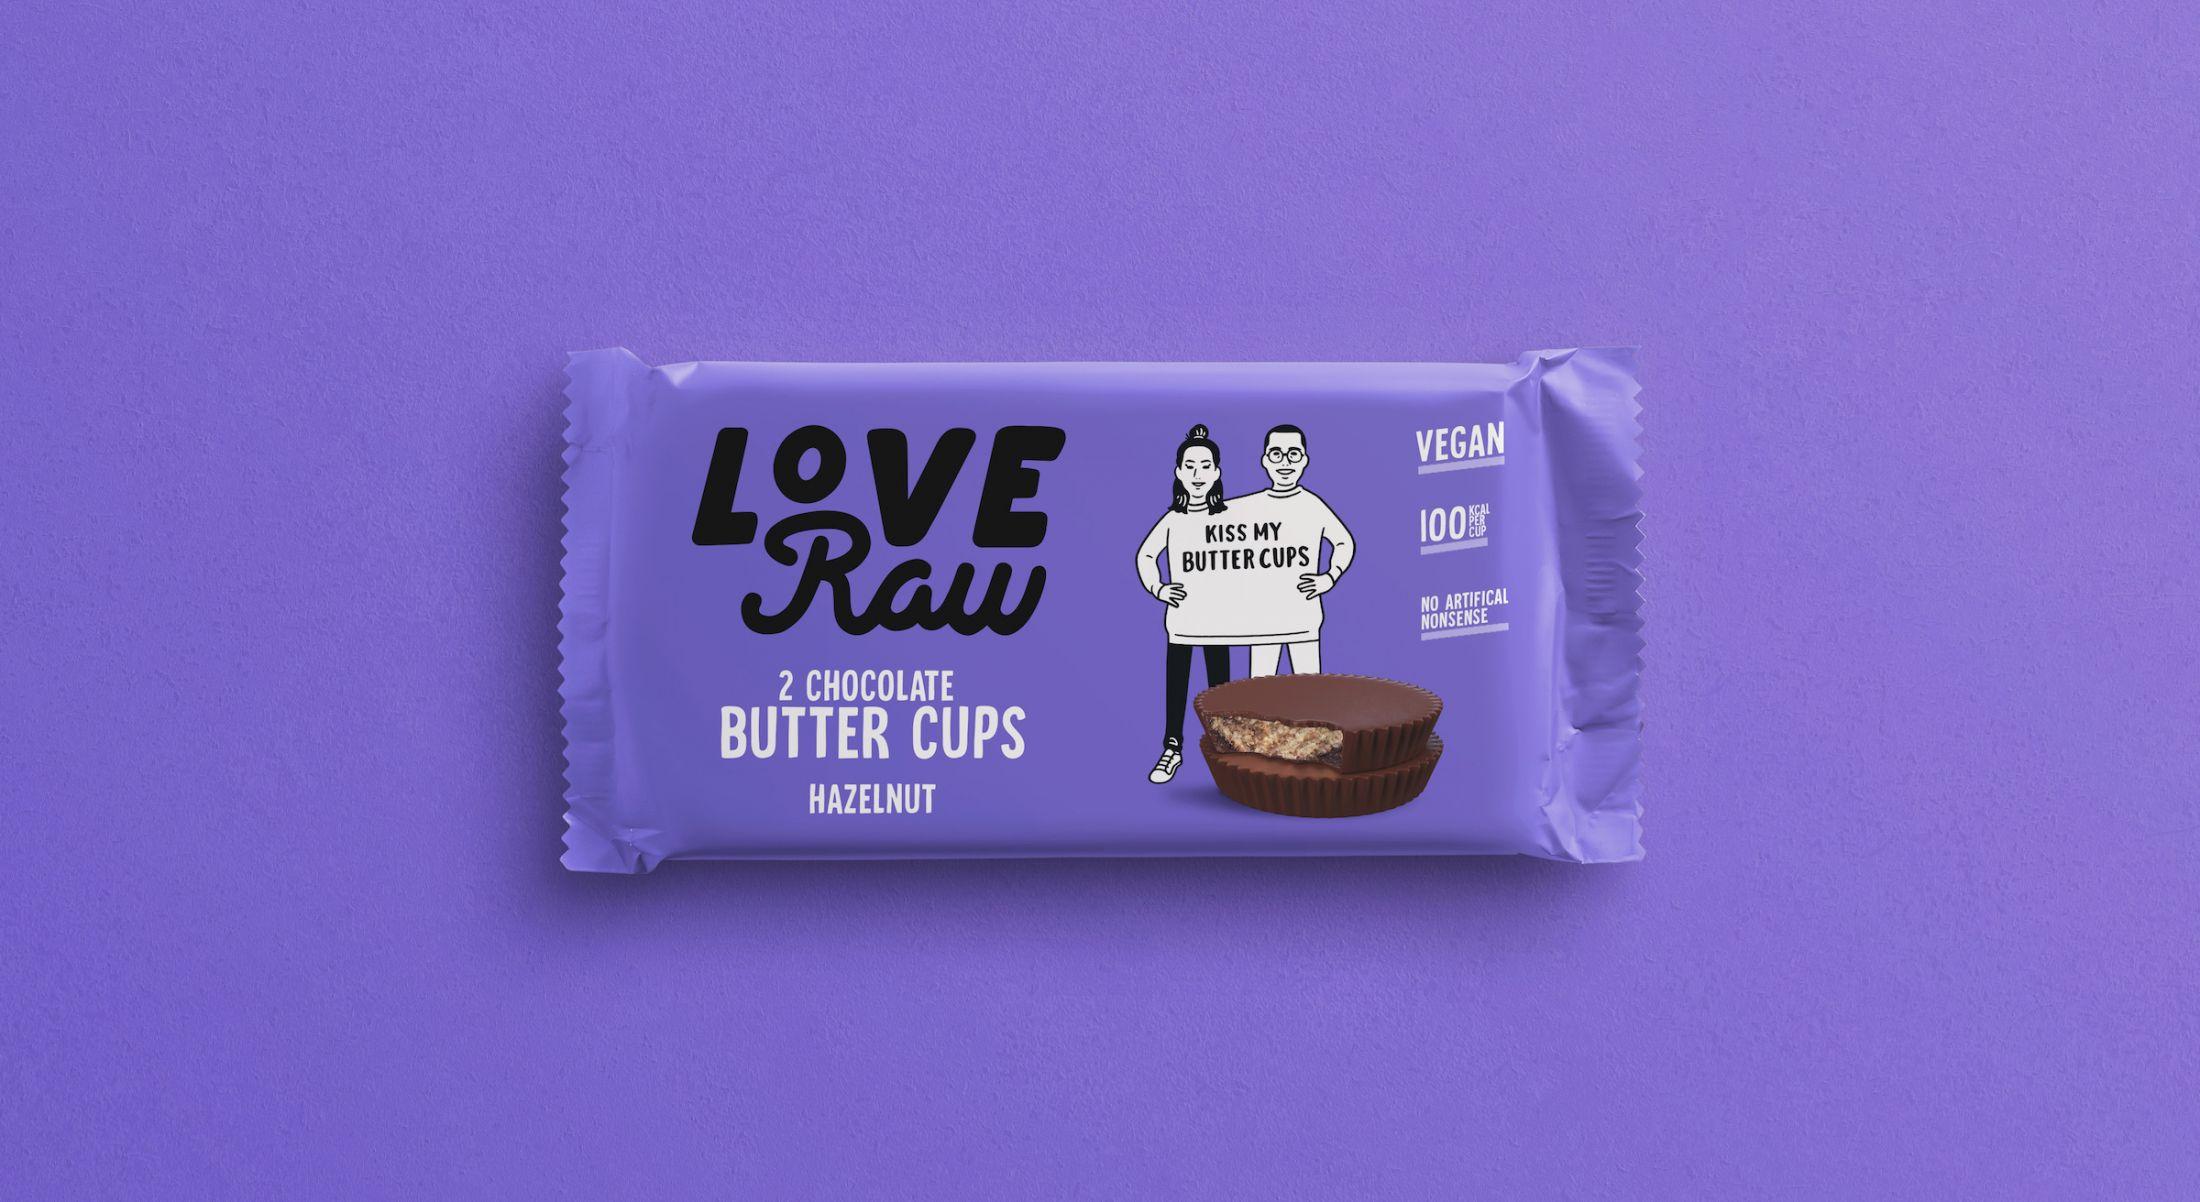 loveraw csoki uj arculat